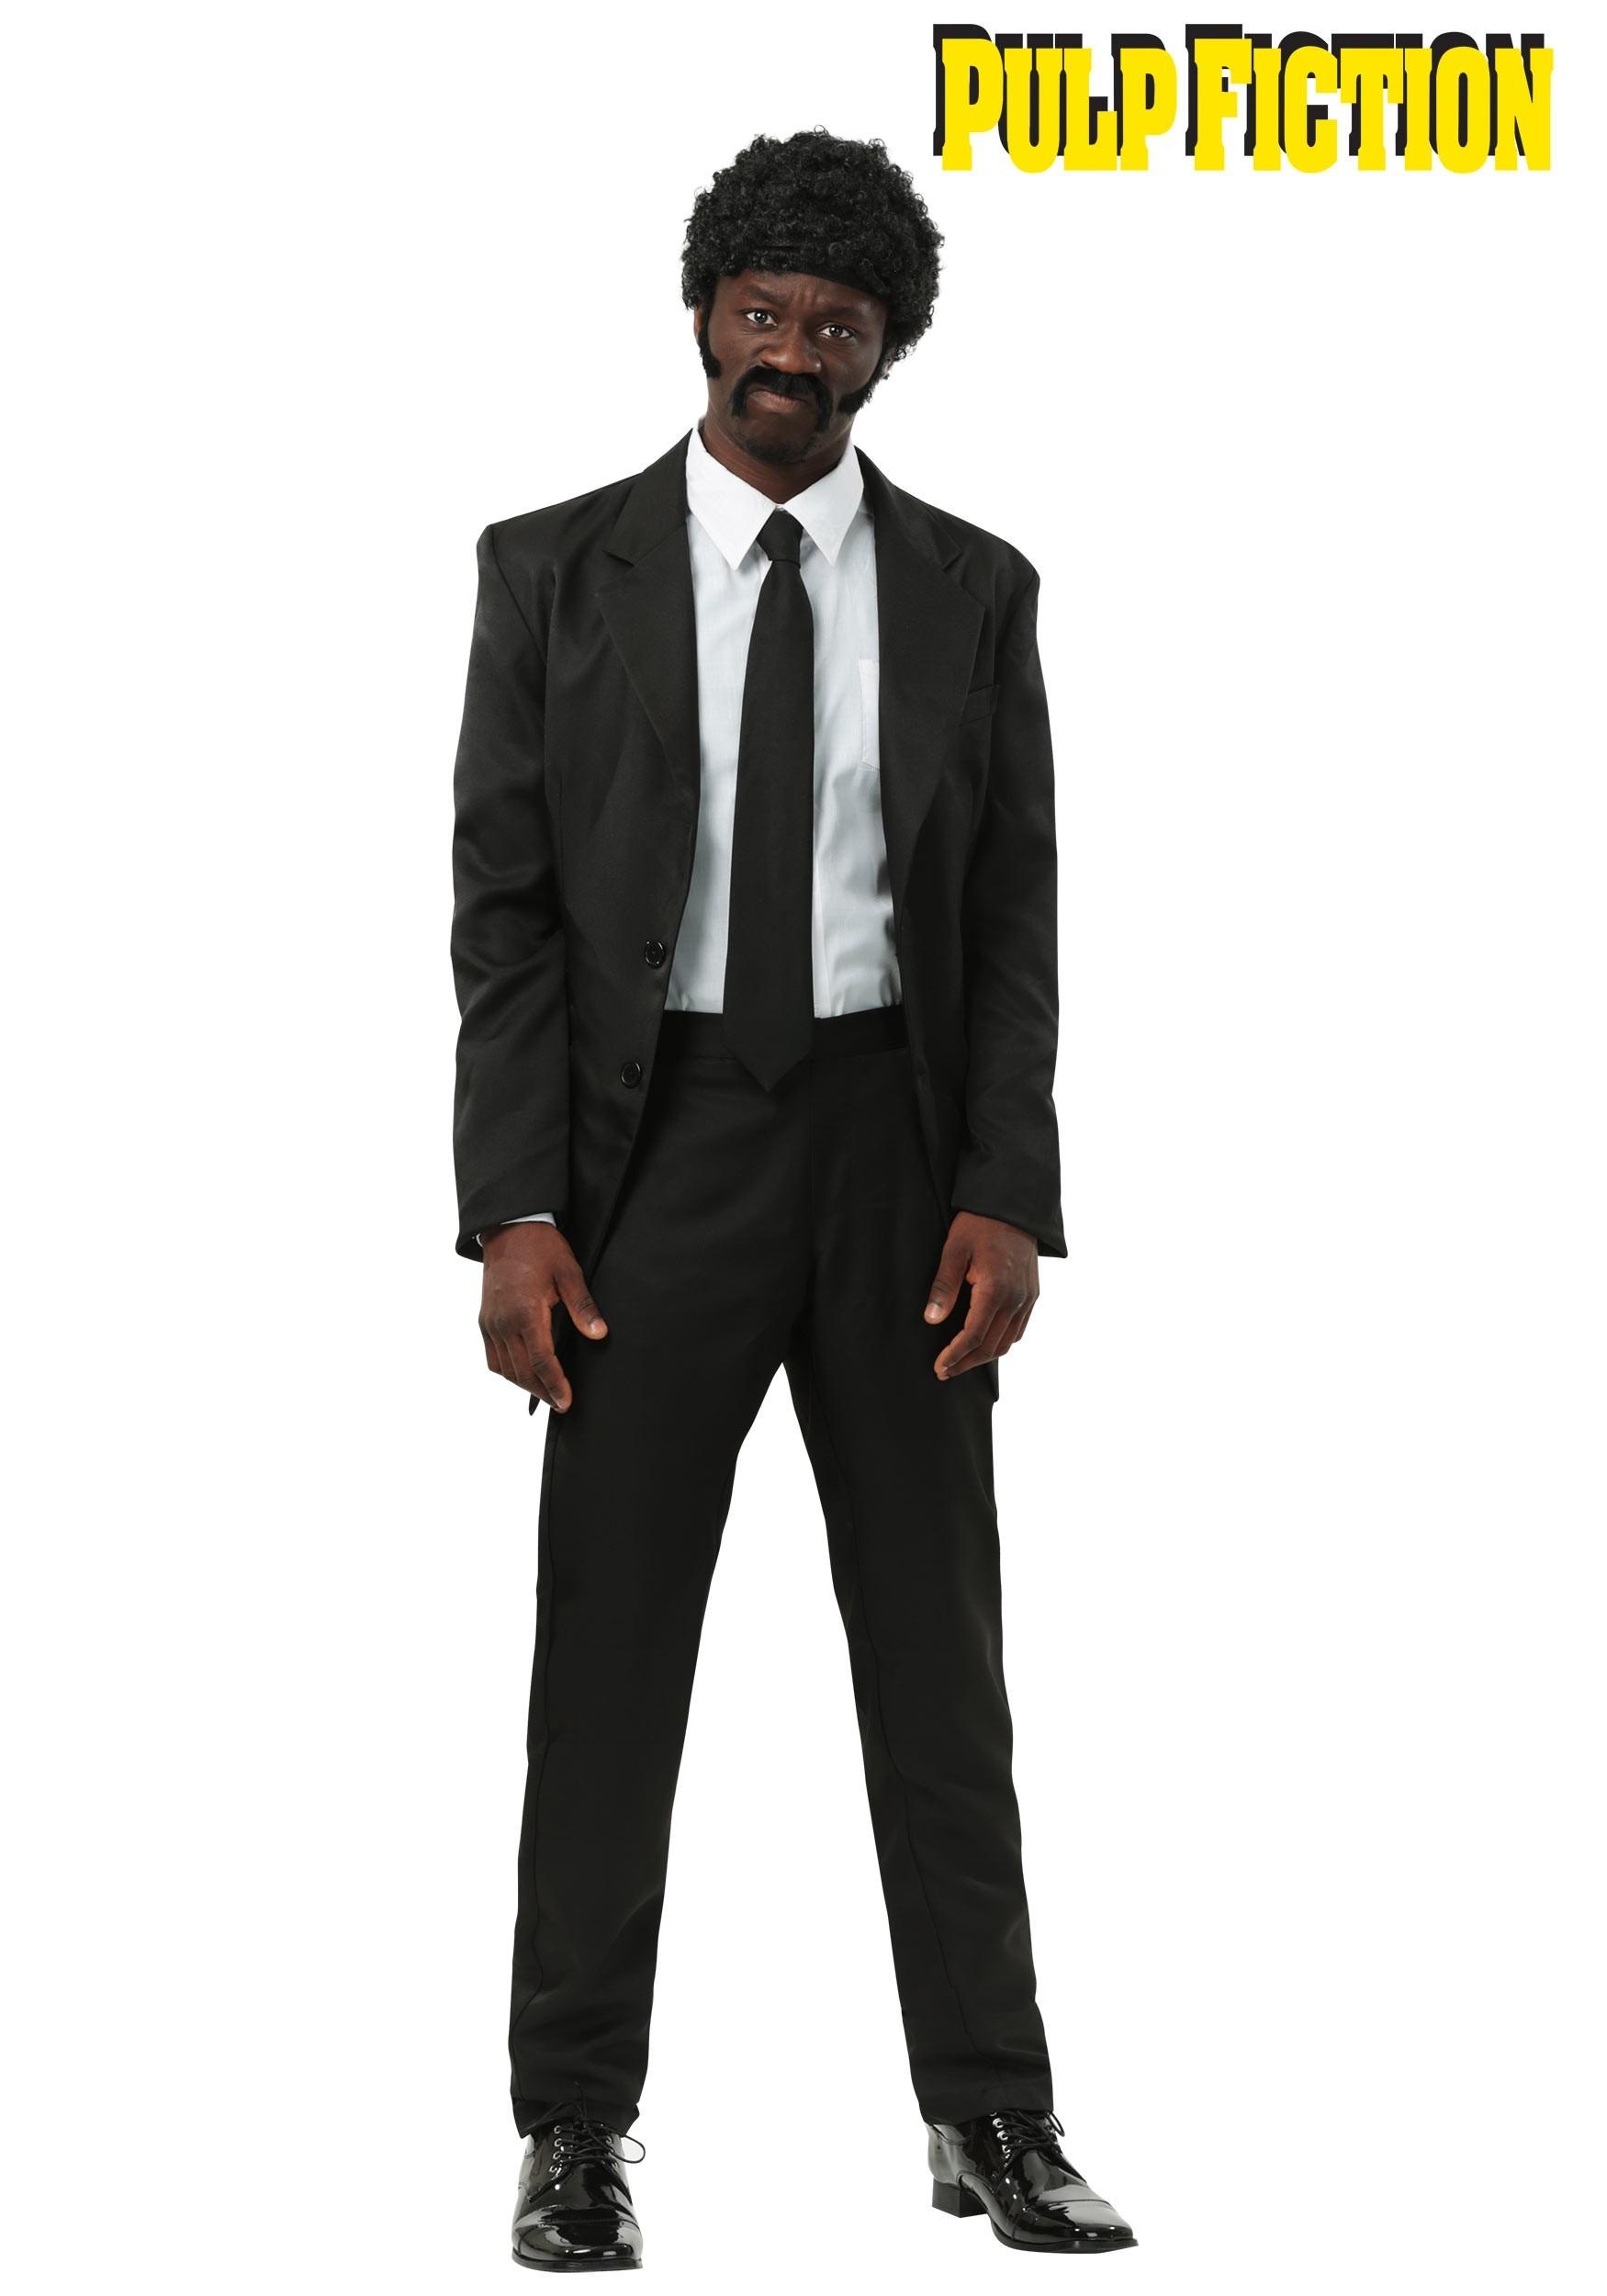 mens pulp fiction suit. Black Bedroom Furniture Sets. Home Design Ideas